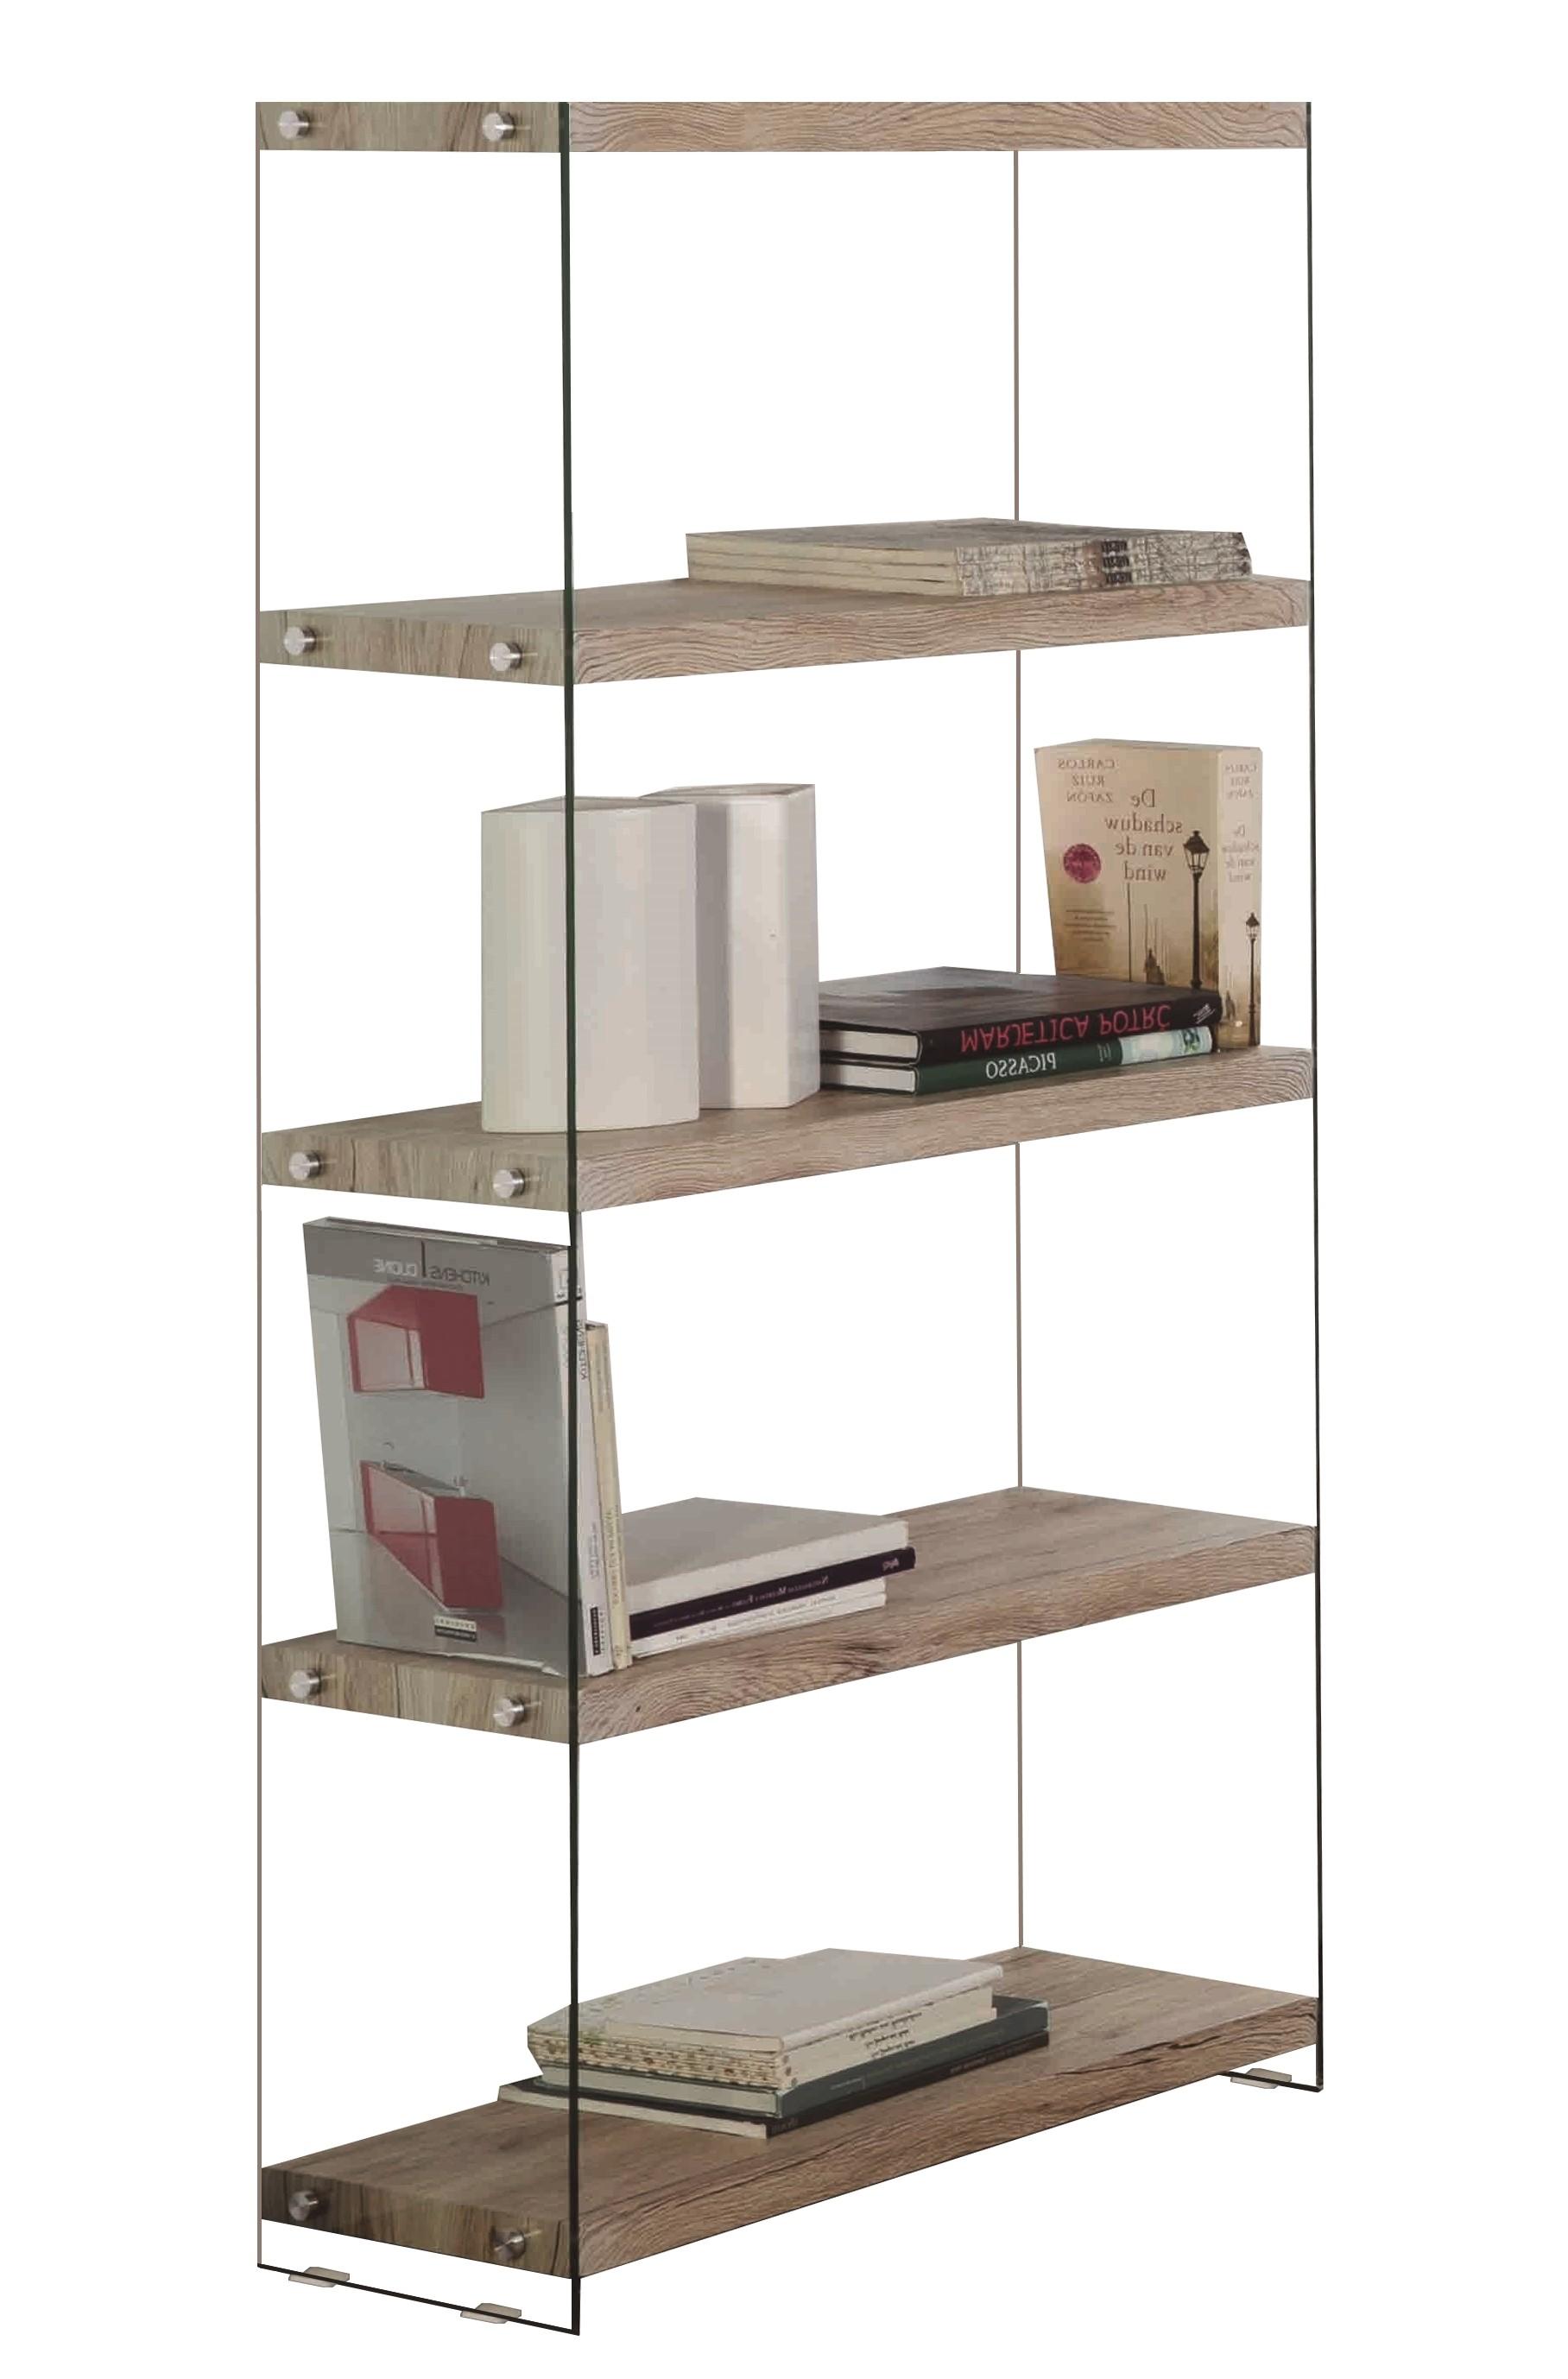 etagere design simple etagere holding category for. Black Bedroom Furniture Sets. Home Design Ideas